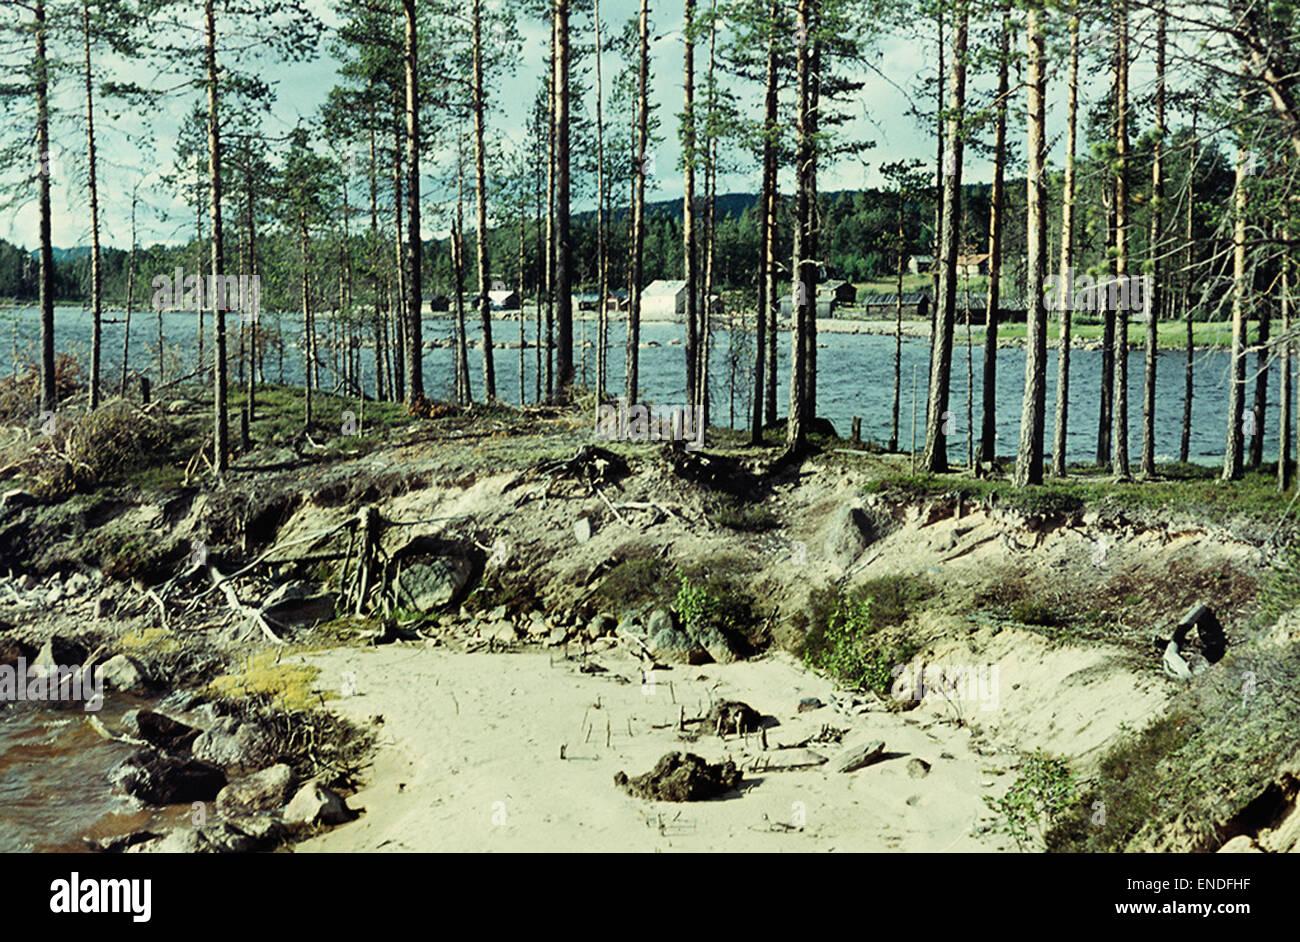 Stone Age settlement at Tisjölandet, Dalarna, Sweden - Stock Image